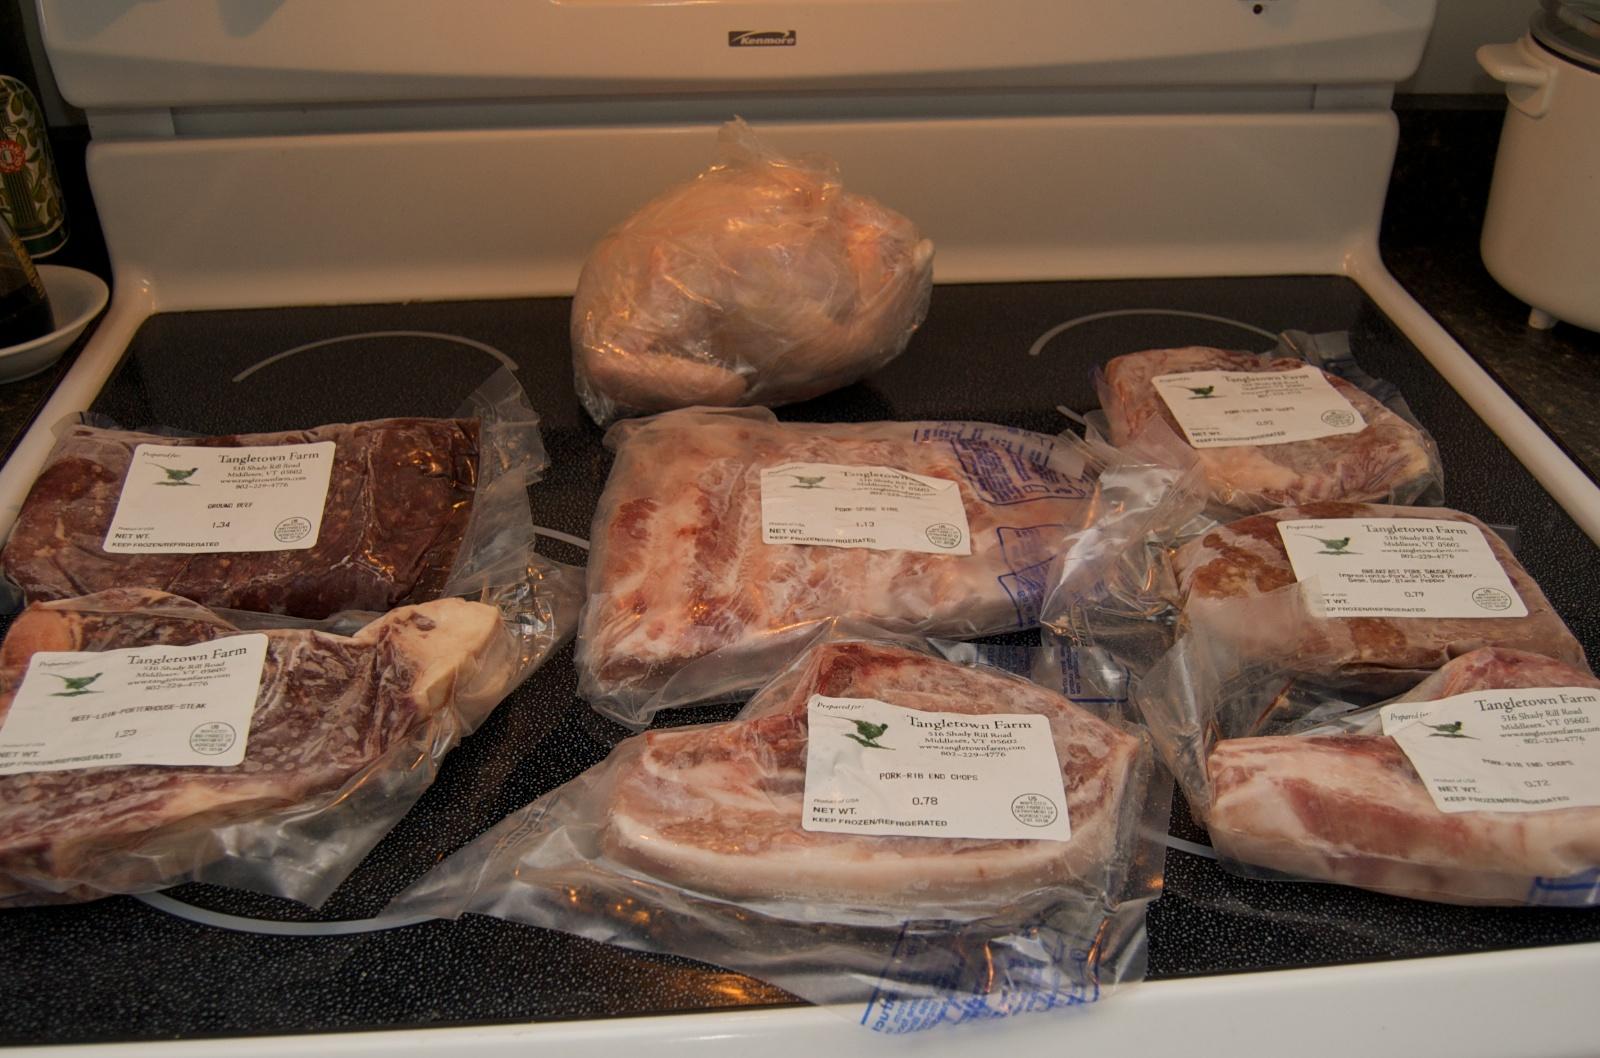 http://blog.rickk.com/food/2010/06/26/meat-csa1.jpg